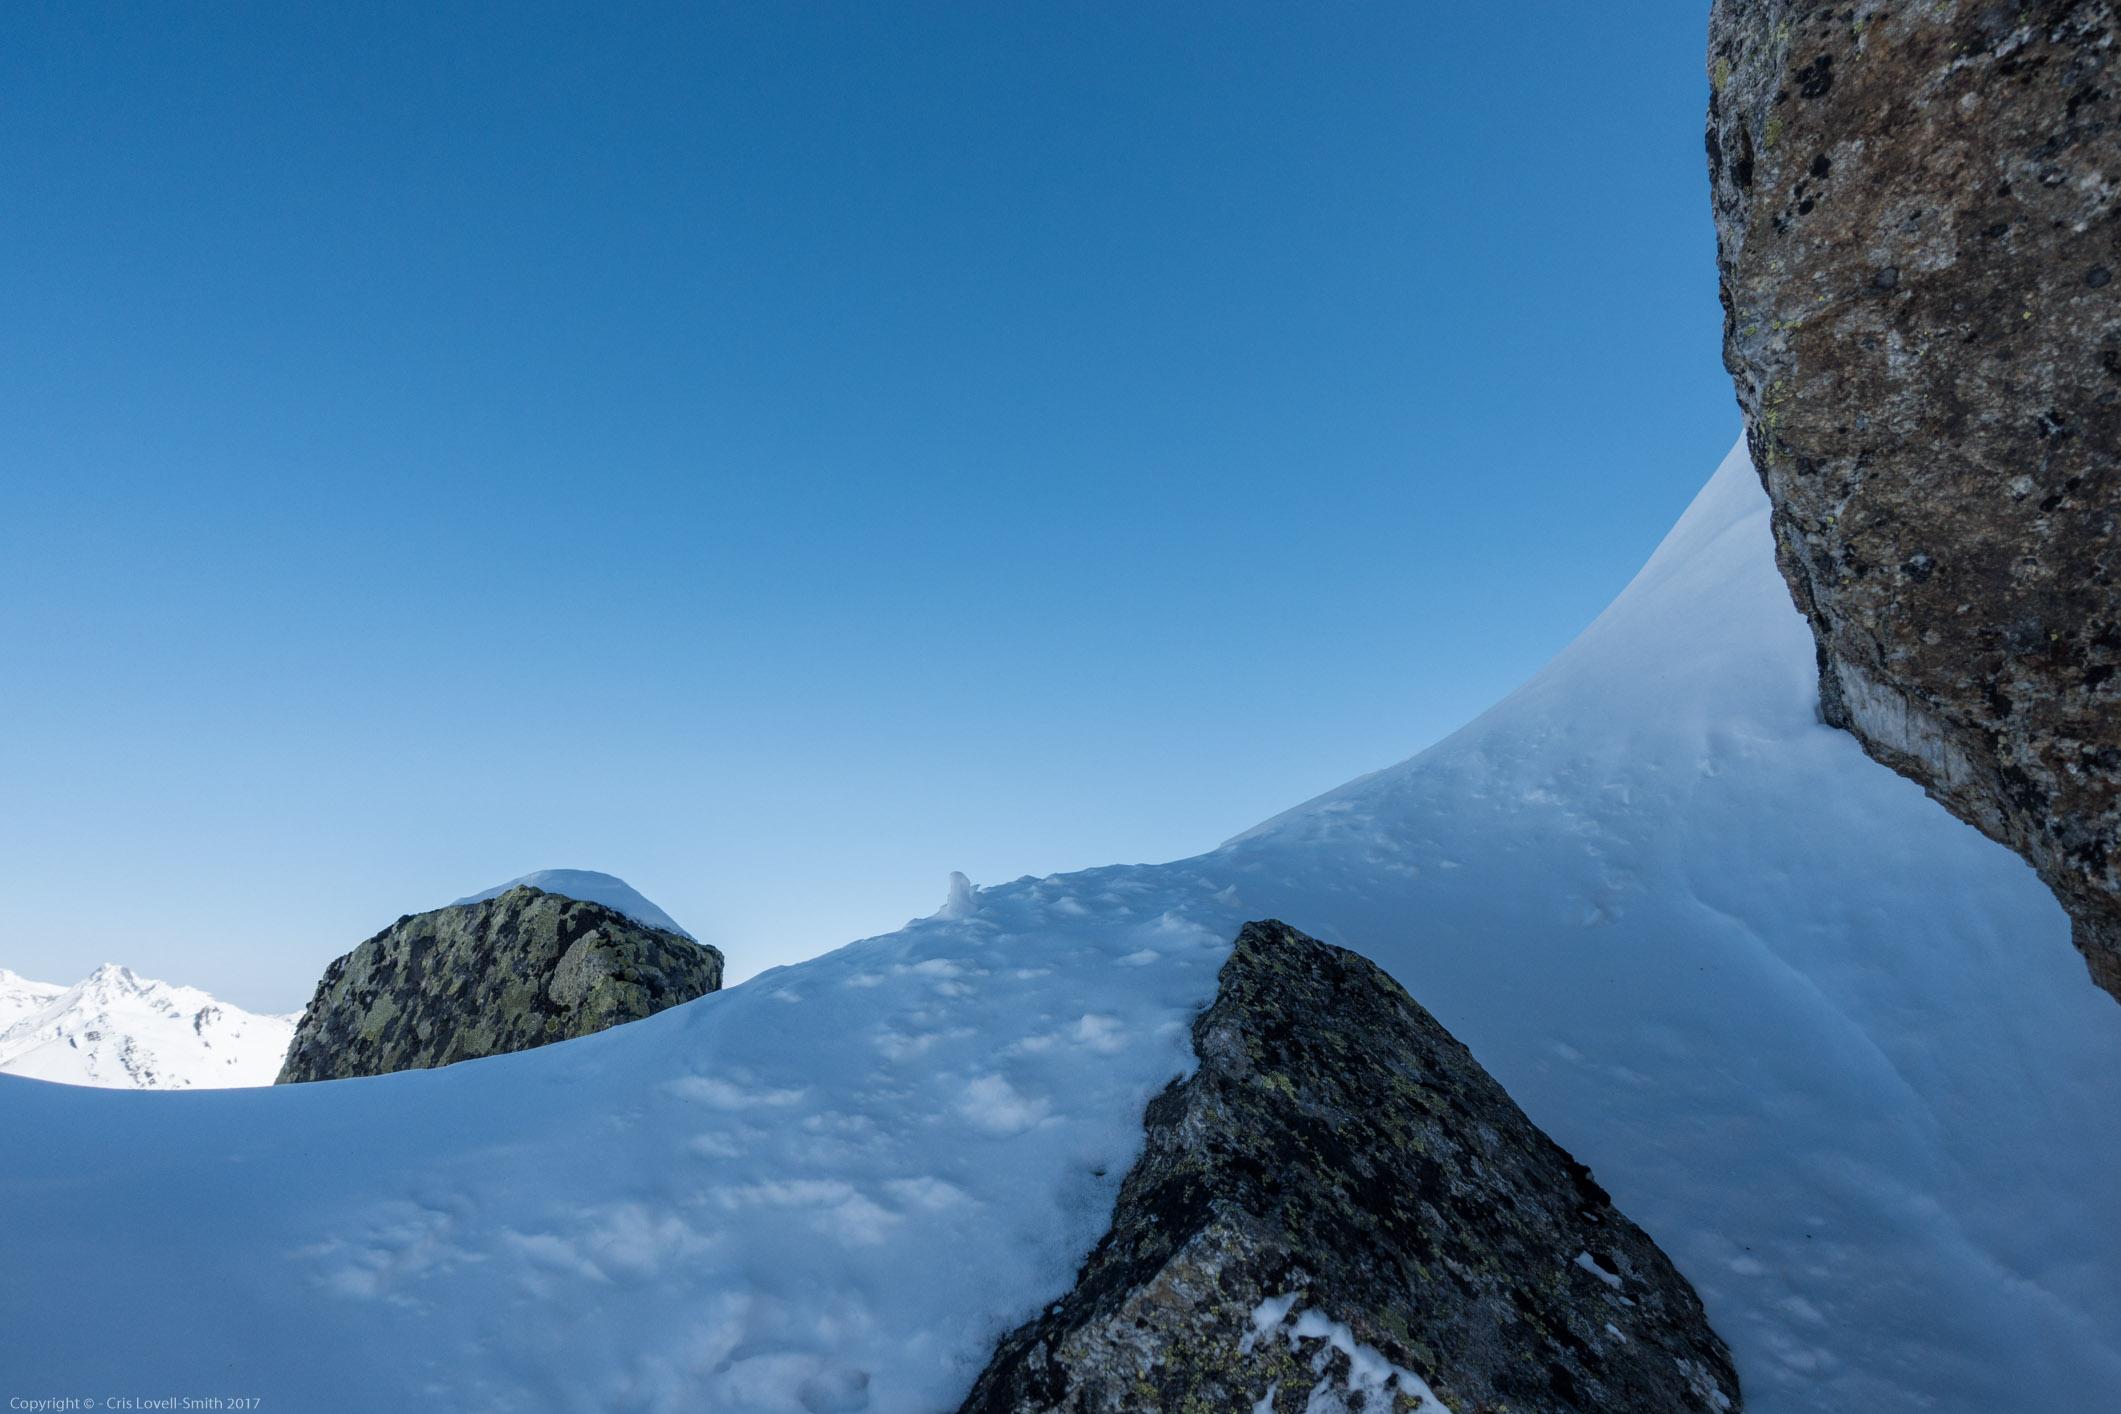 Snow, rock and blue (Arlberger Winterklettersteig March 2017)